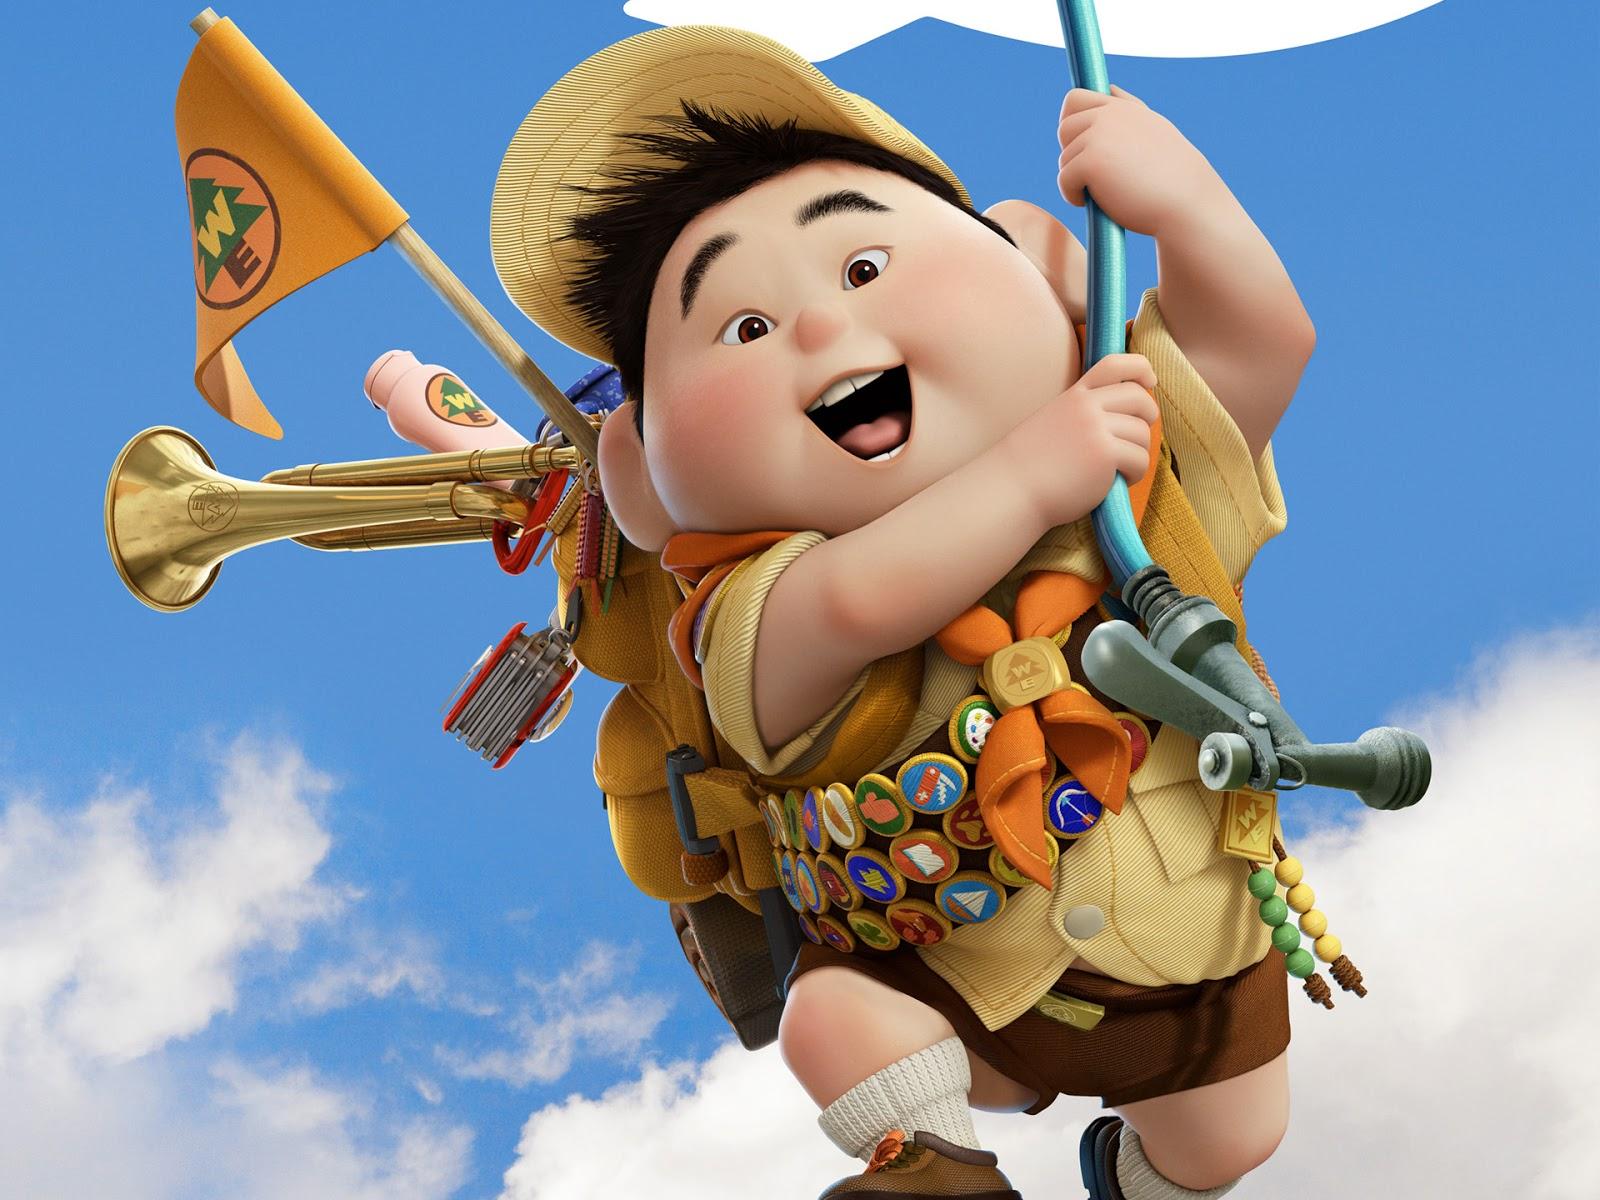 Disney Hd Wallpapers Disney Pixar Up Russell Hd Wallpapers